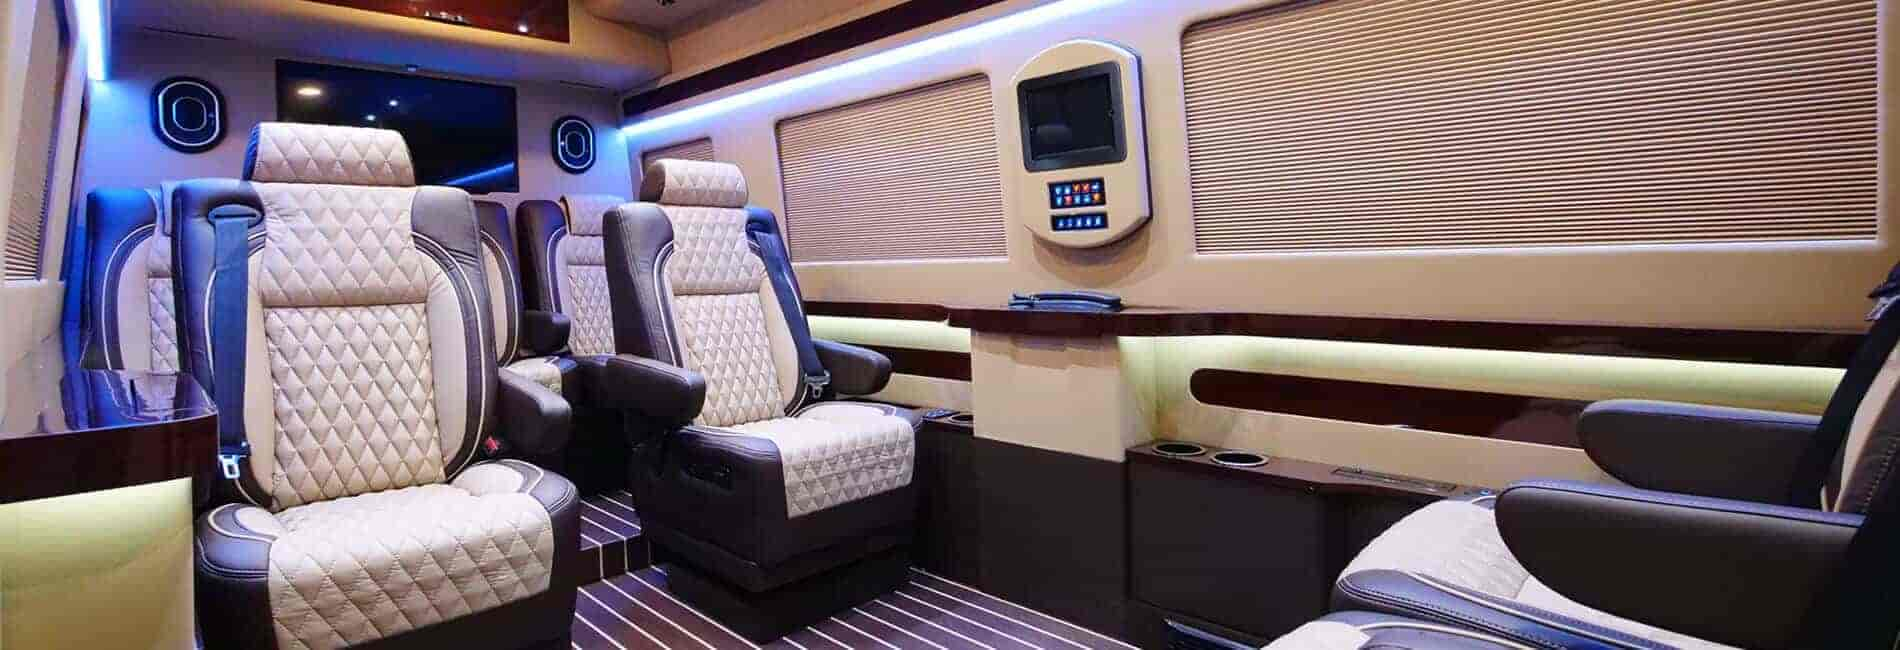 Private Mobile Office Custom Van